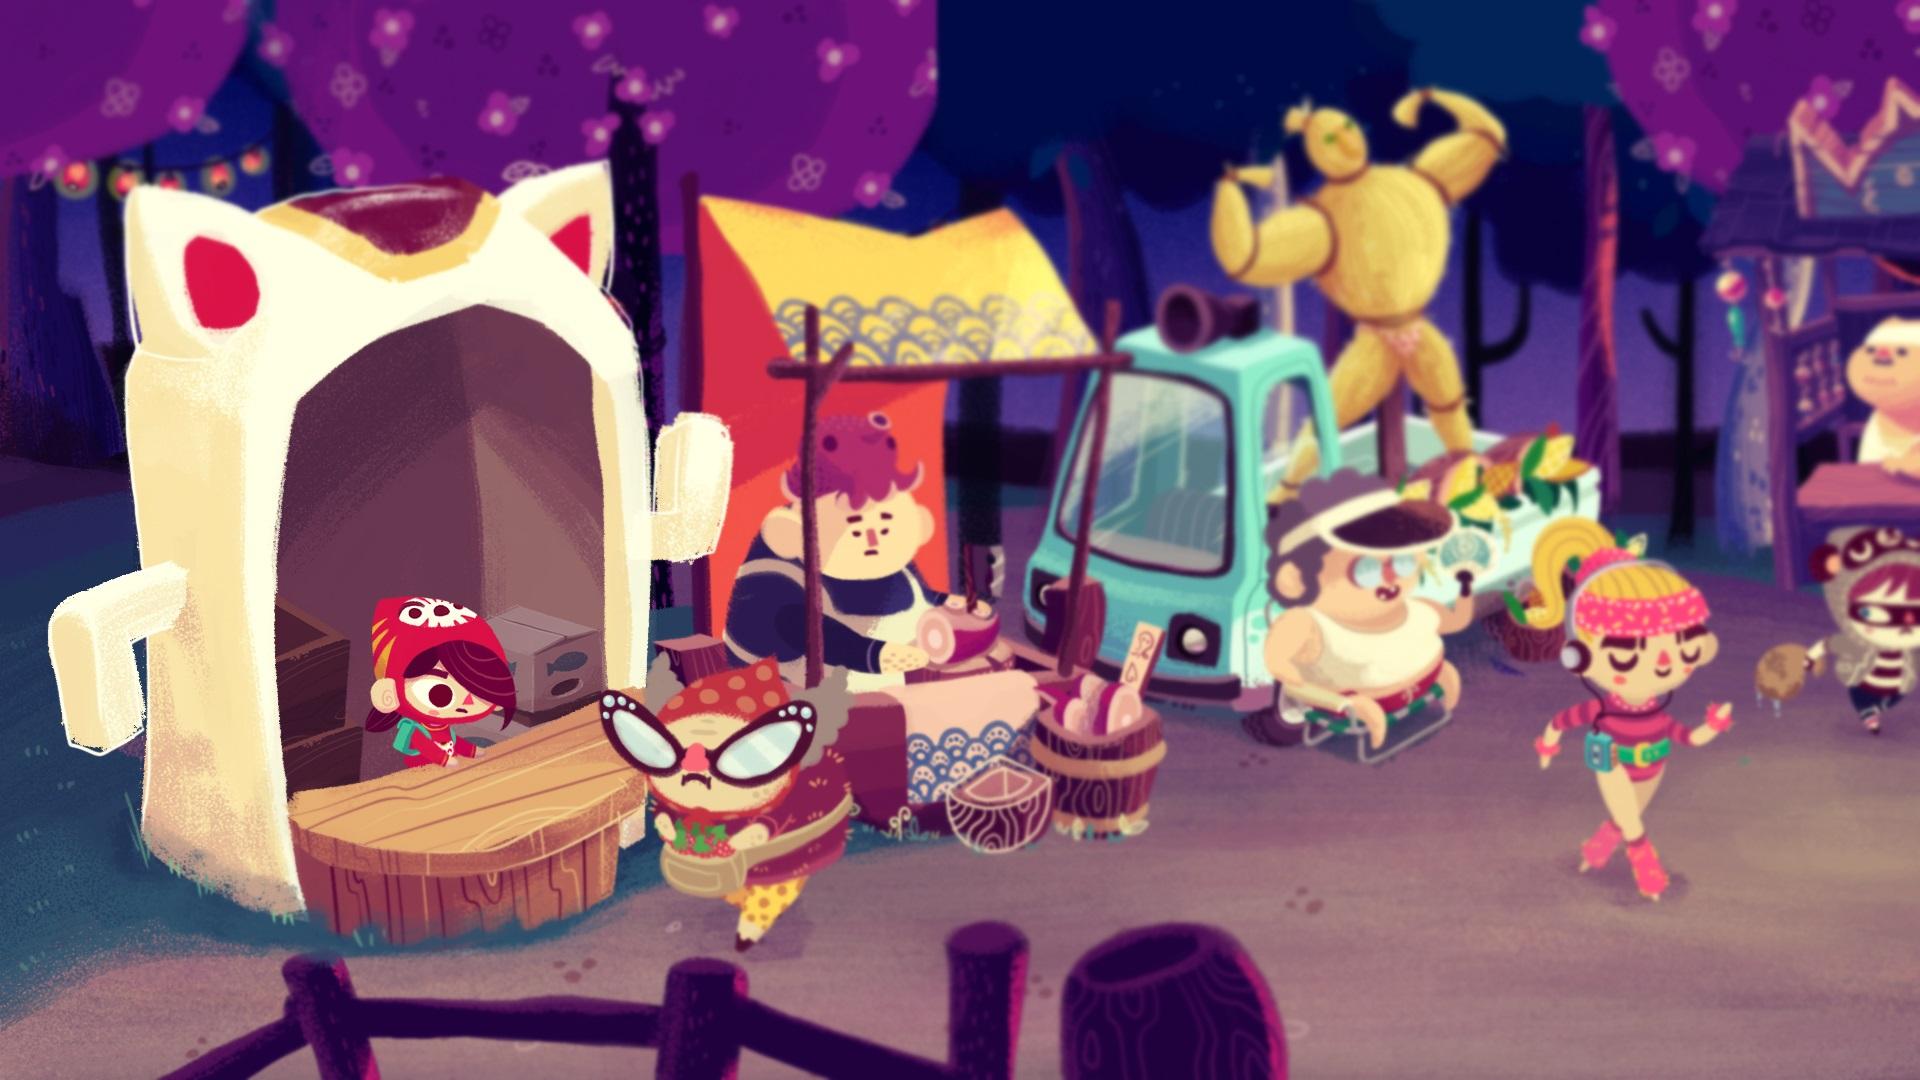 Mineko's Night Market, Meowza Games, Indie Game, Harvest Moon, Animal Crossing, Nintendo Switch